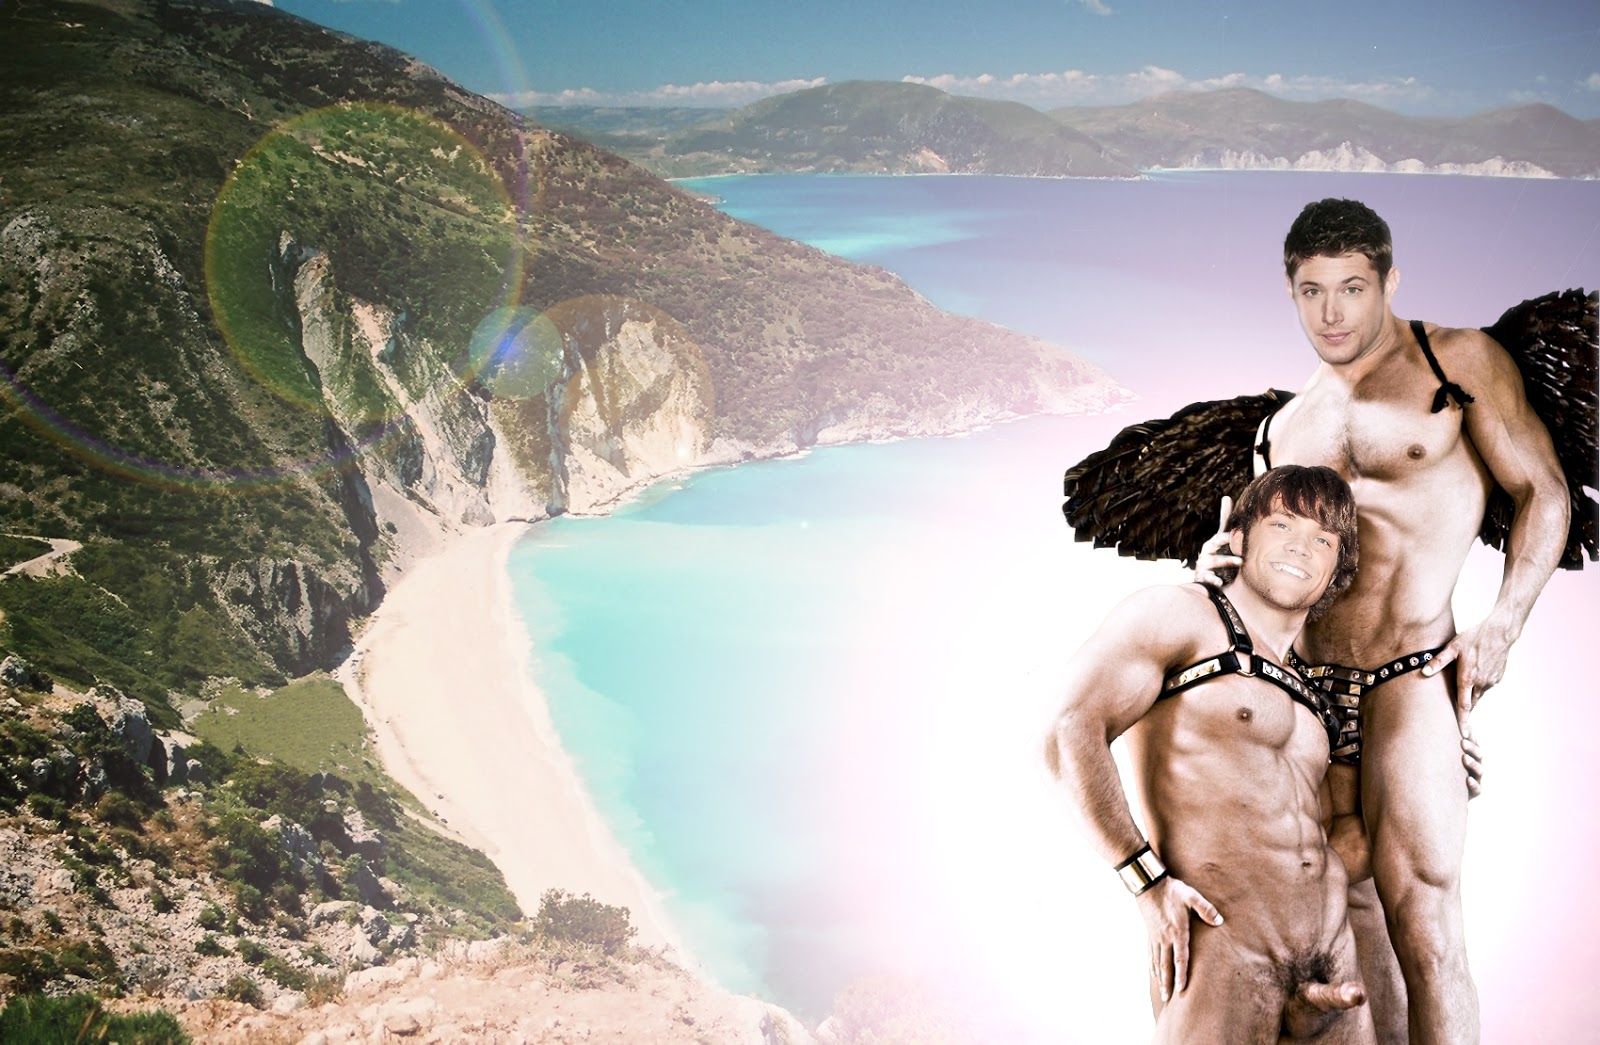 http://3.bp.blogspot.com/-LlSy1LJFp0Y/UKi7dQ-qCHI/AAAAAAAAGds/VDmsR32vE0o/s1600/icarus+jensen+ackles+jared+padalecki+naked.jpg